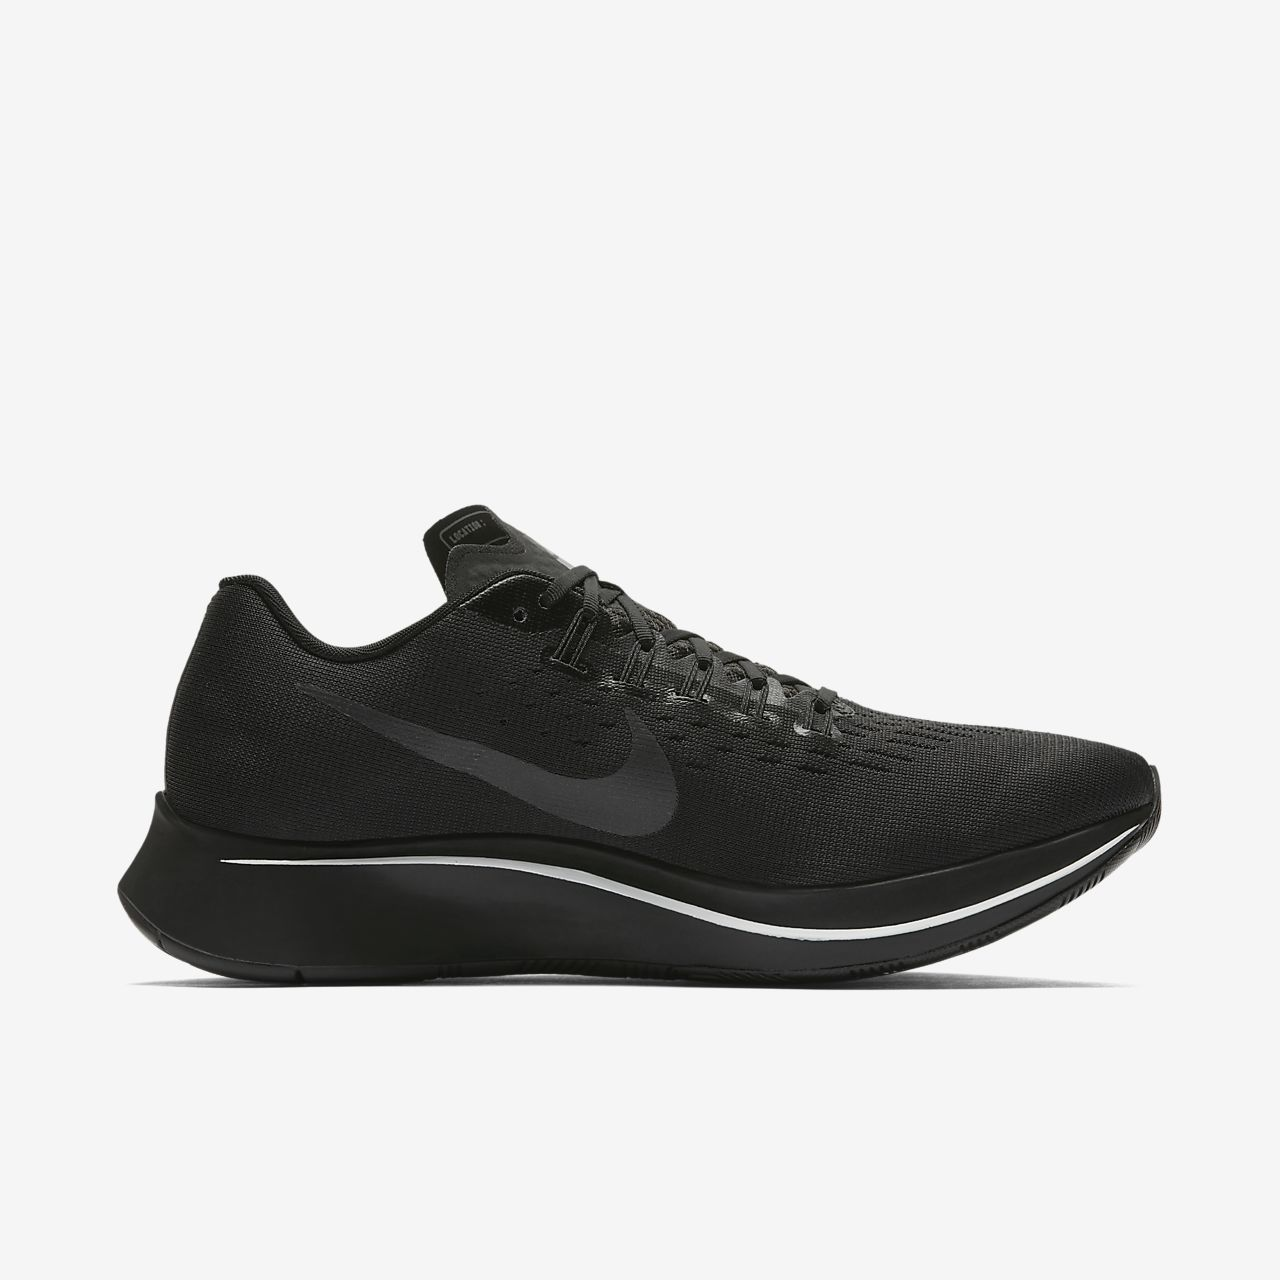 38c6b32a5dff4e Nike Zoom Fly Men s Running Shoe. Nike.com AU